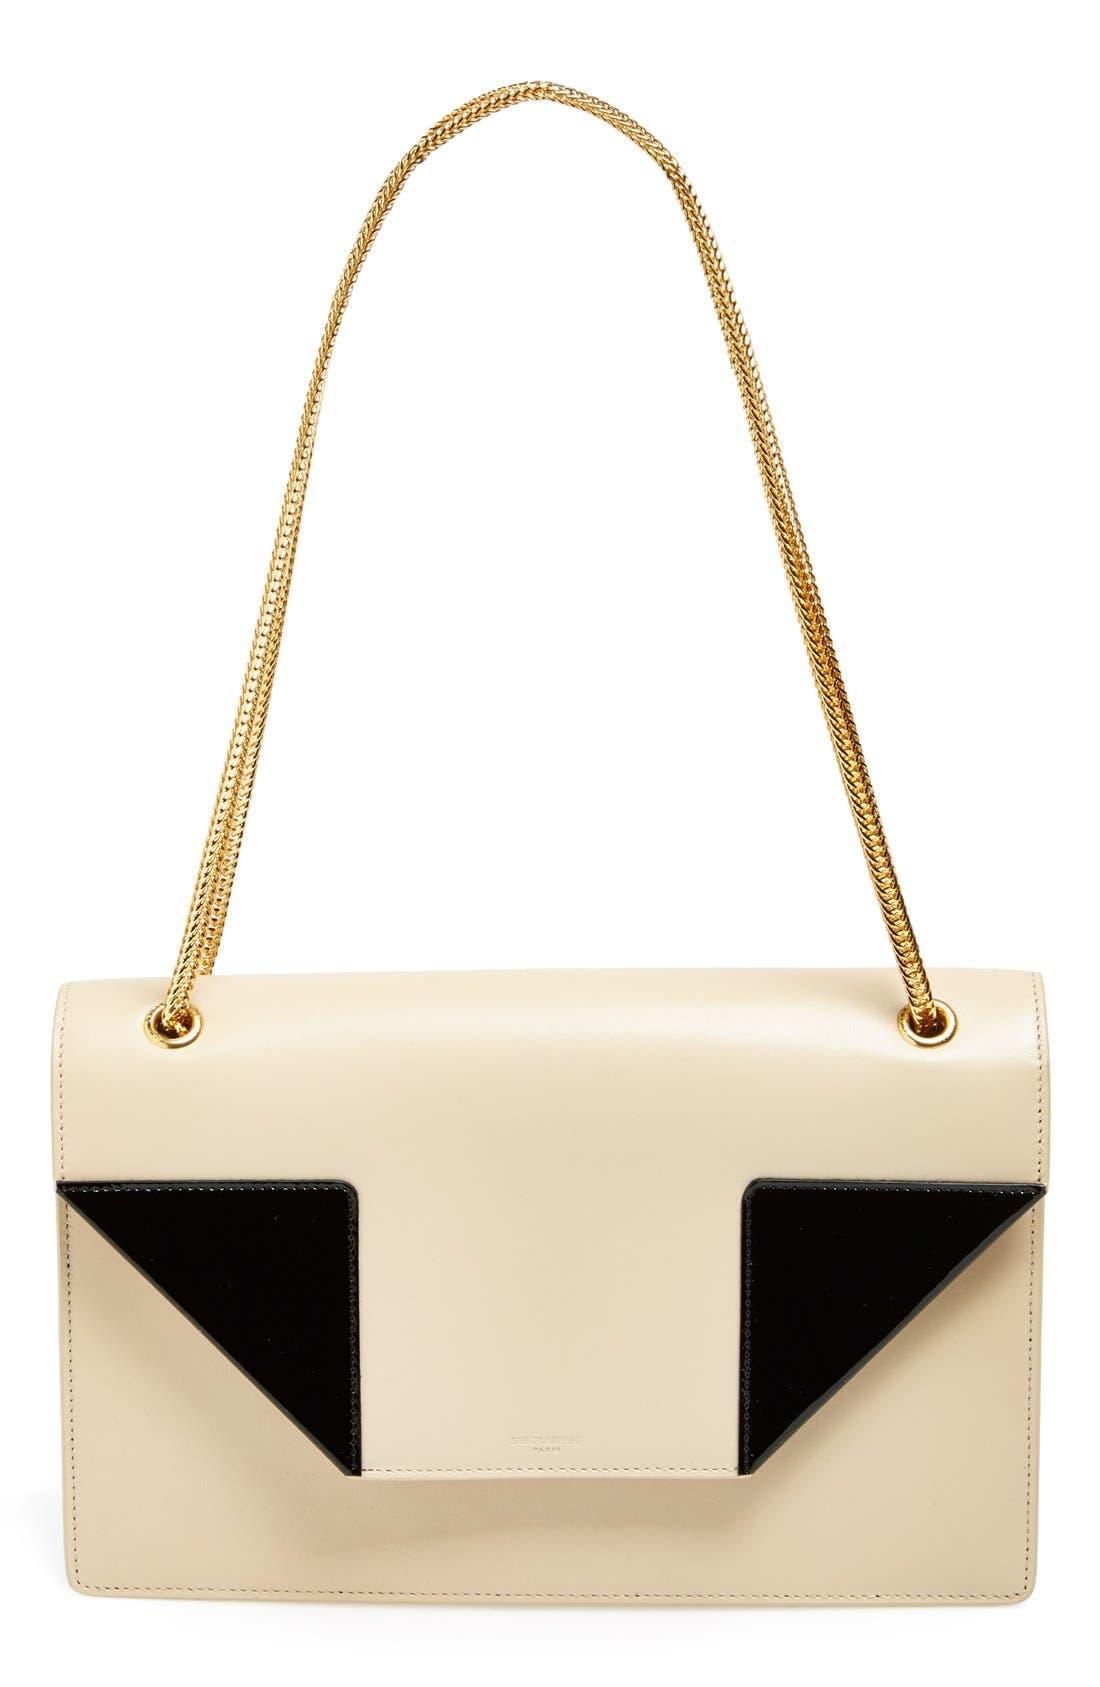 Alternate Image 1 Selected - Saint Laurent 'Medium Betty' Calfskin Shoulder Bag